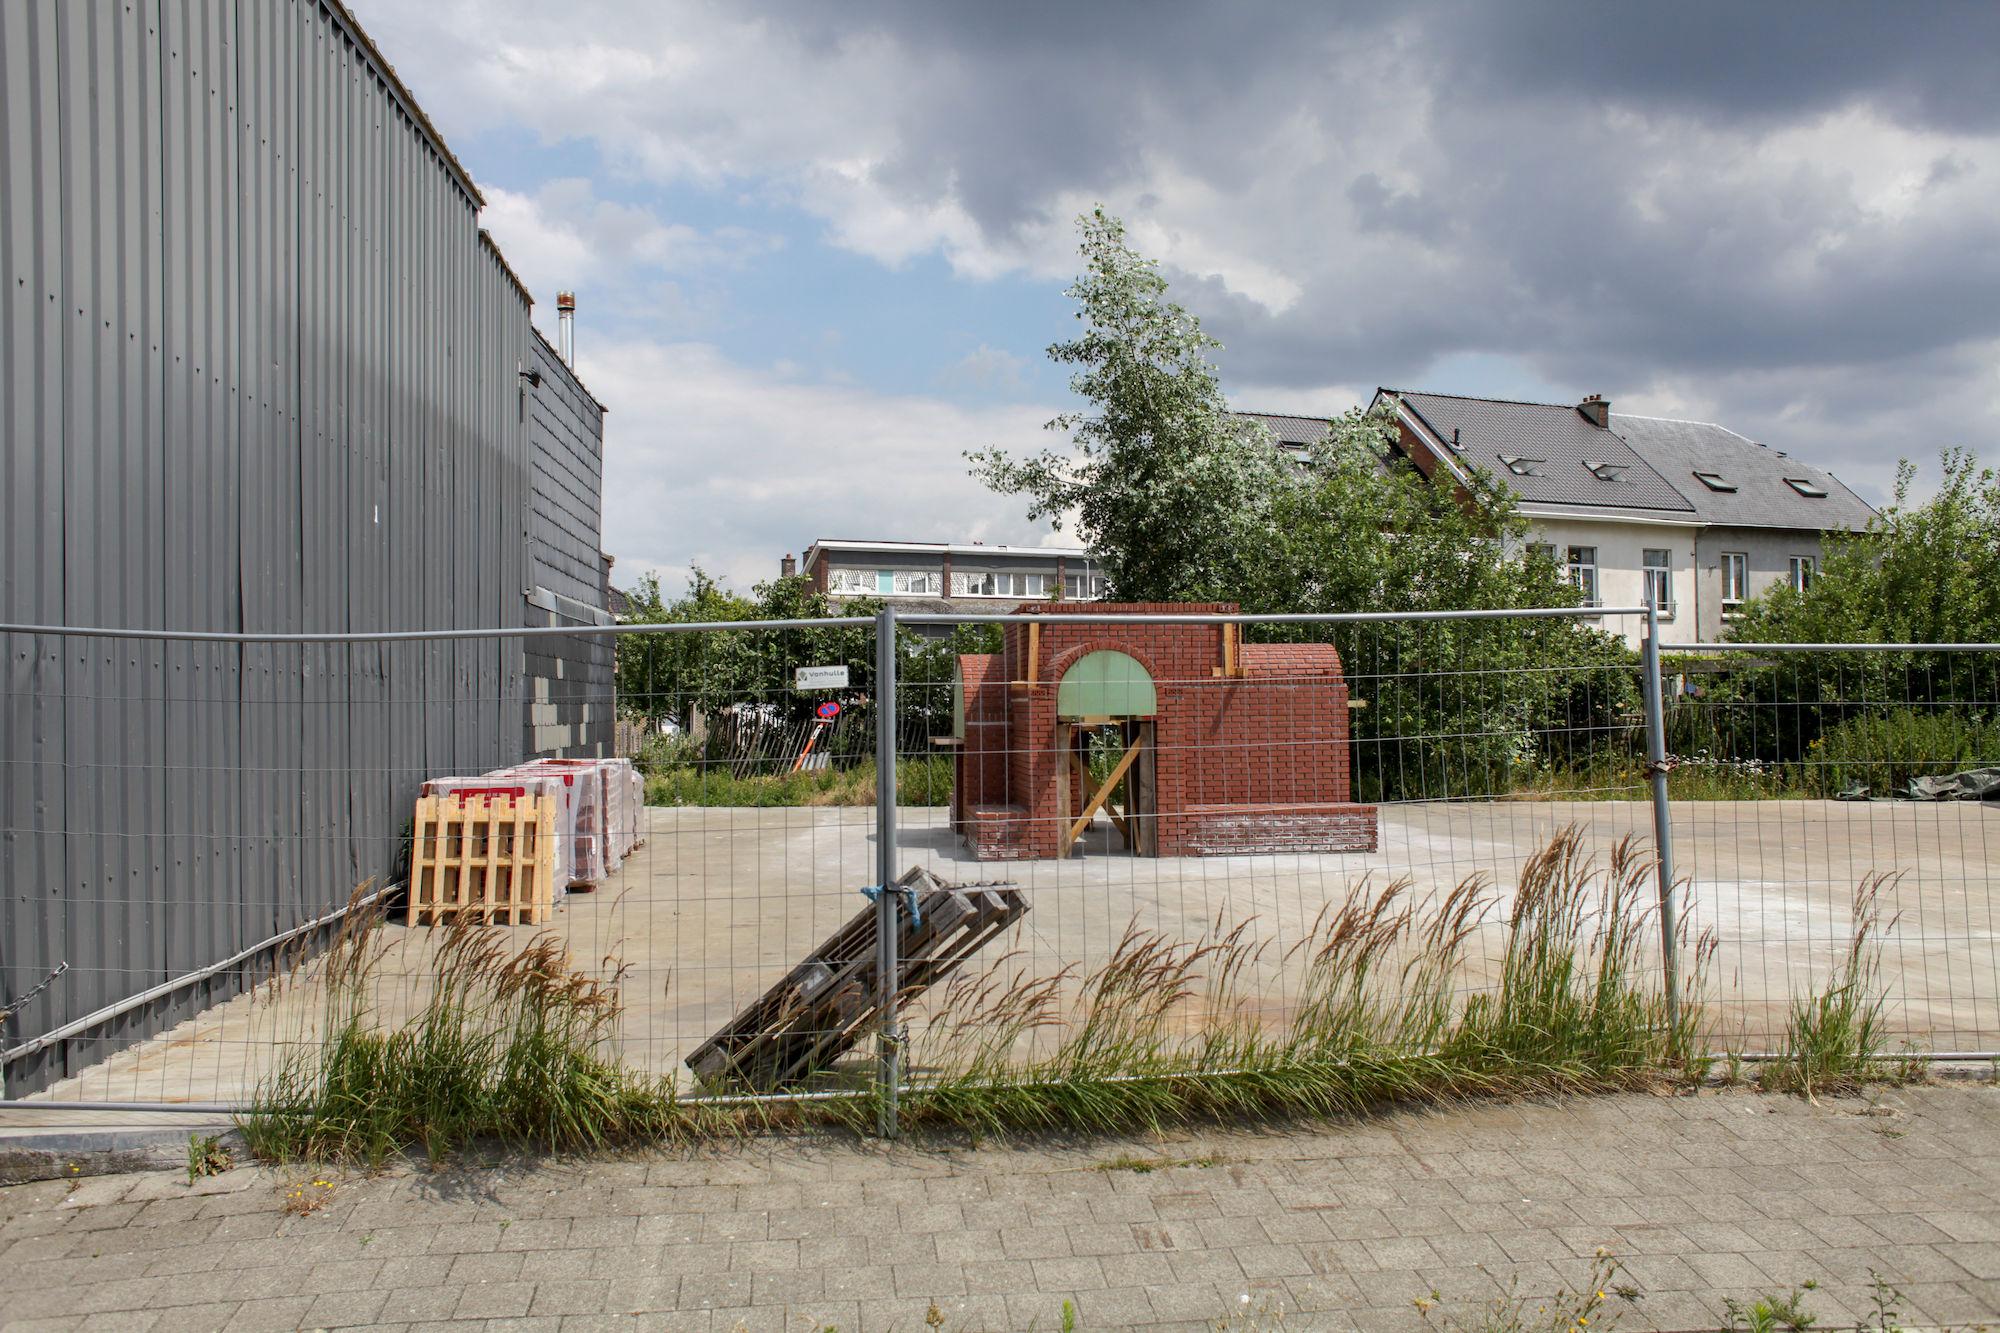 2019-07-02 Muide Meulestede prospectie Wannes_stadsvernieuwing_IMG_0382-3.jpg